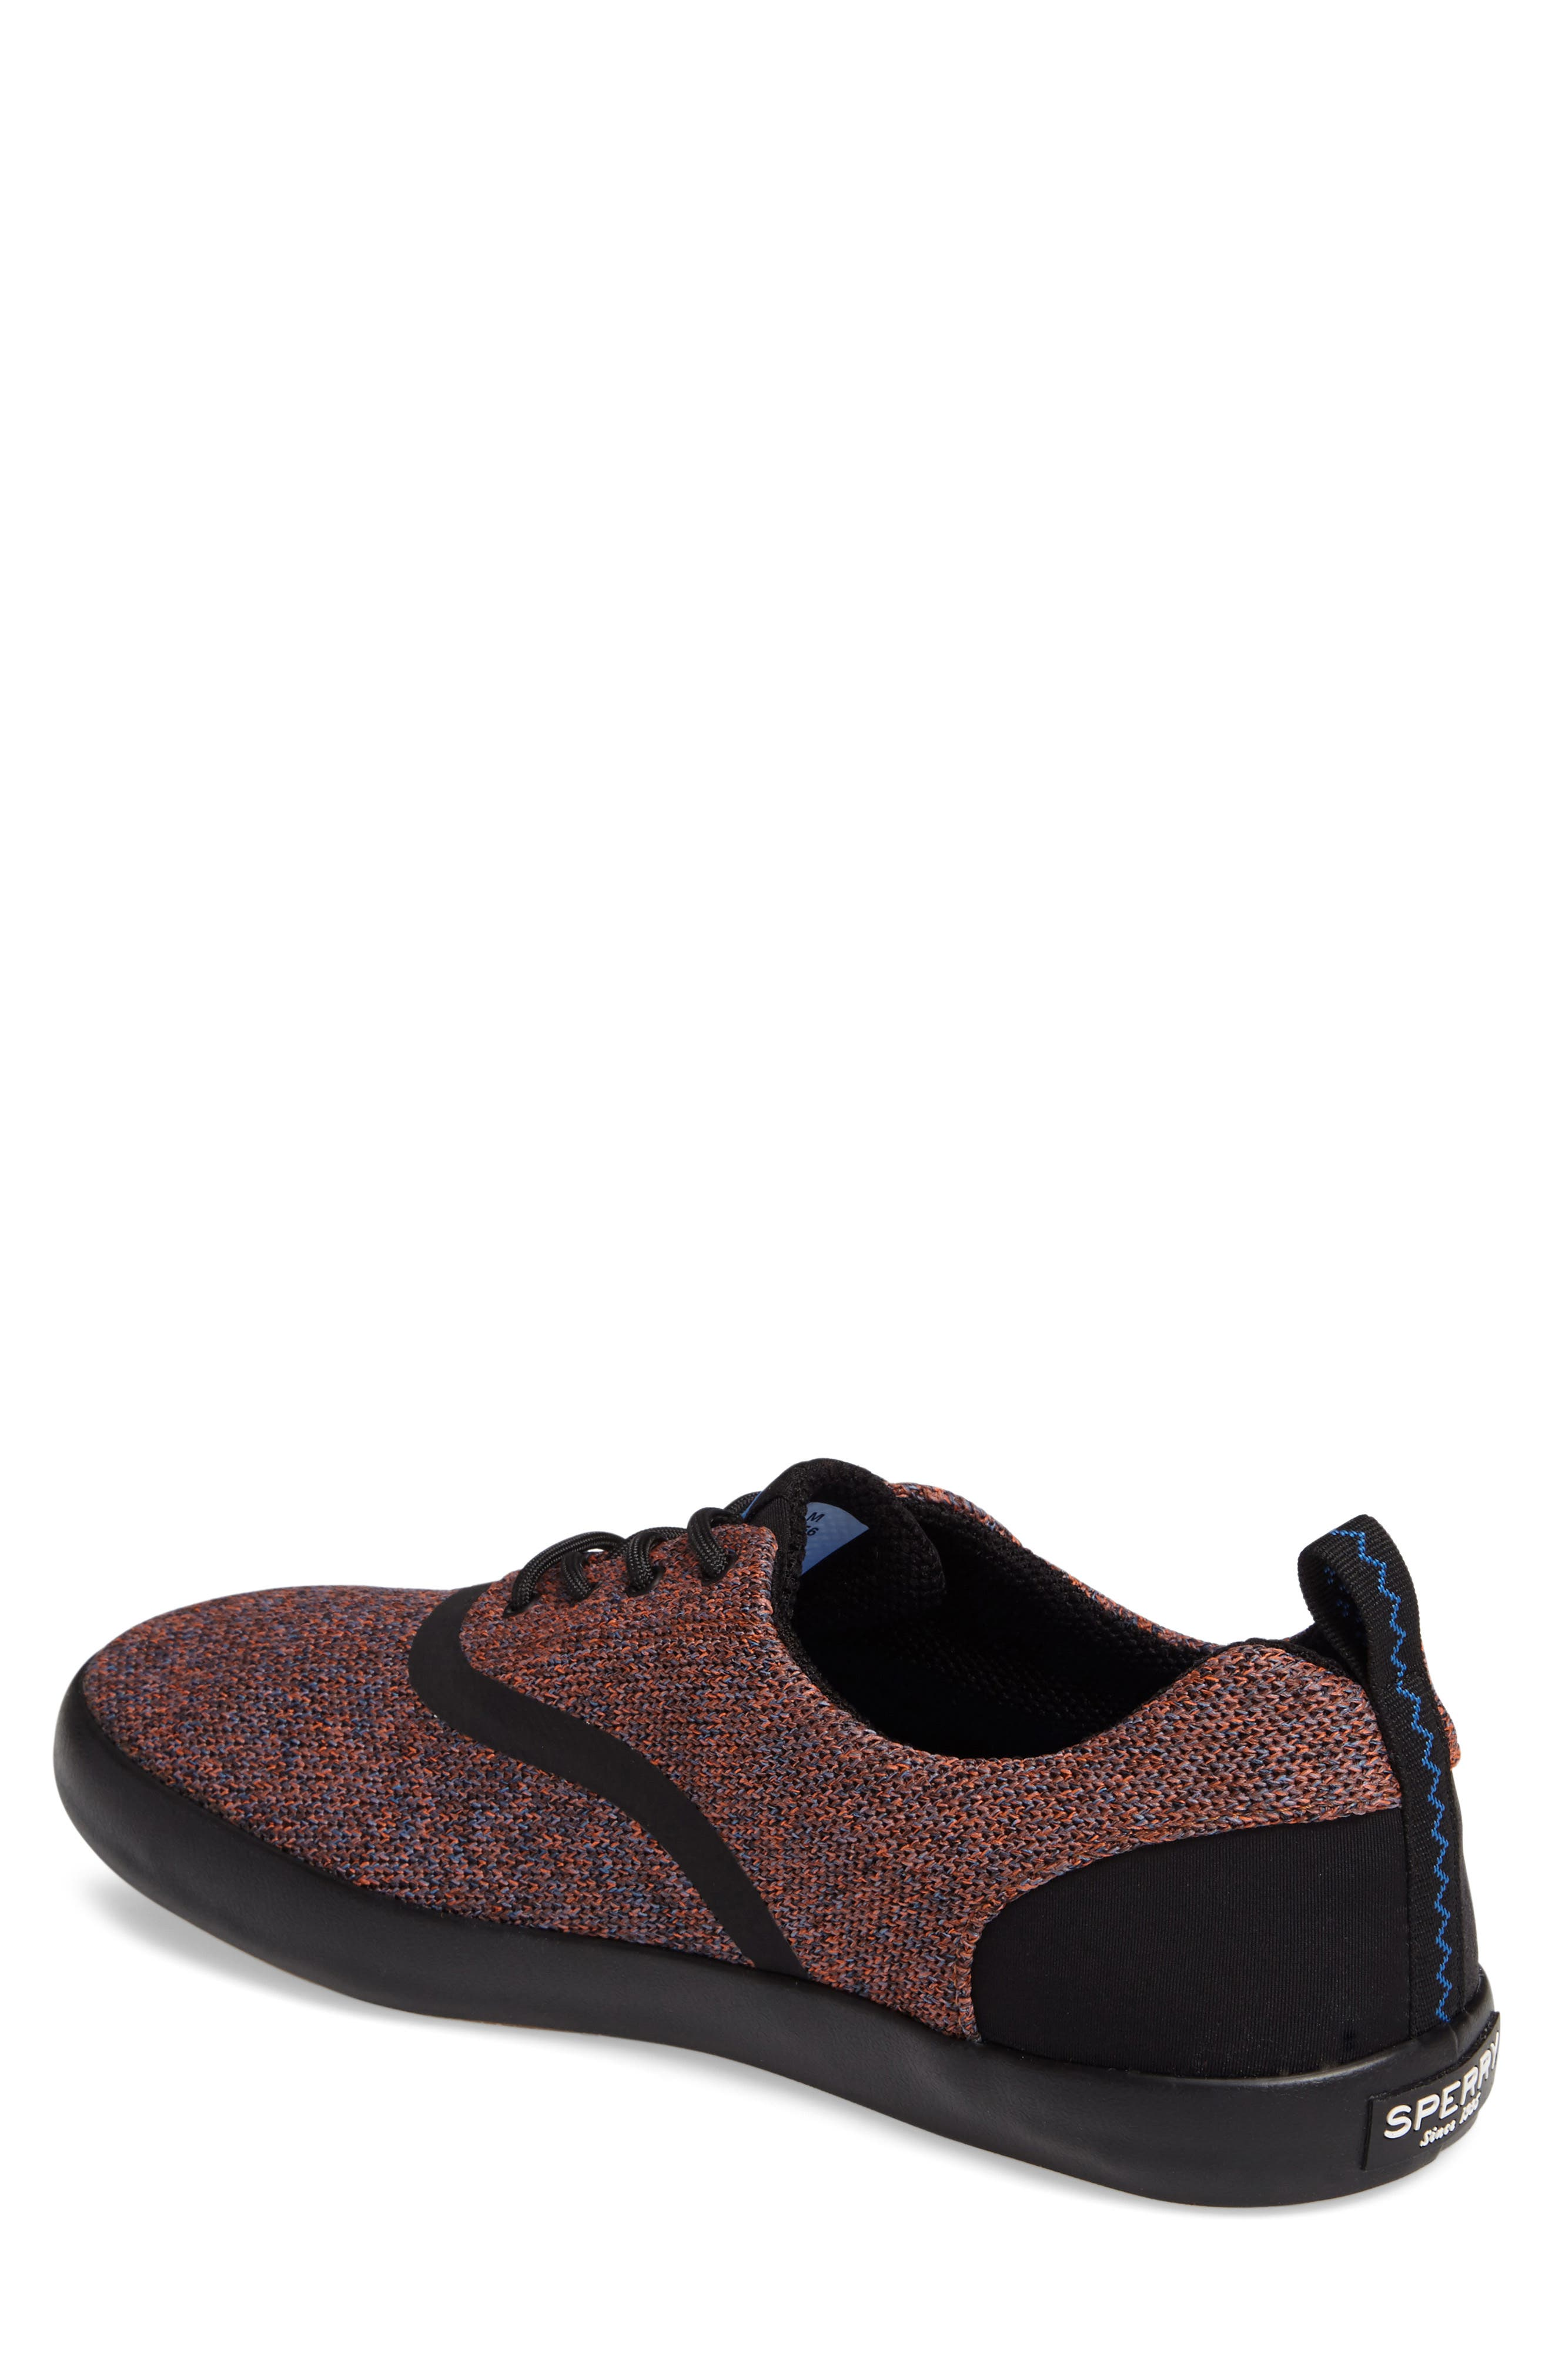 Alternate Image 2  - Paul Sperry Flex Deck Sneaker (Men)